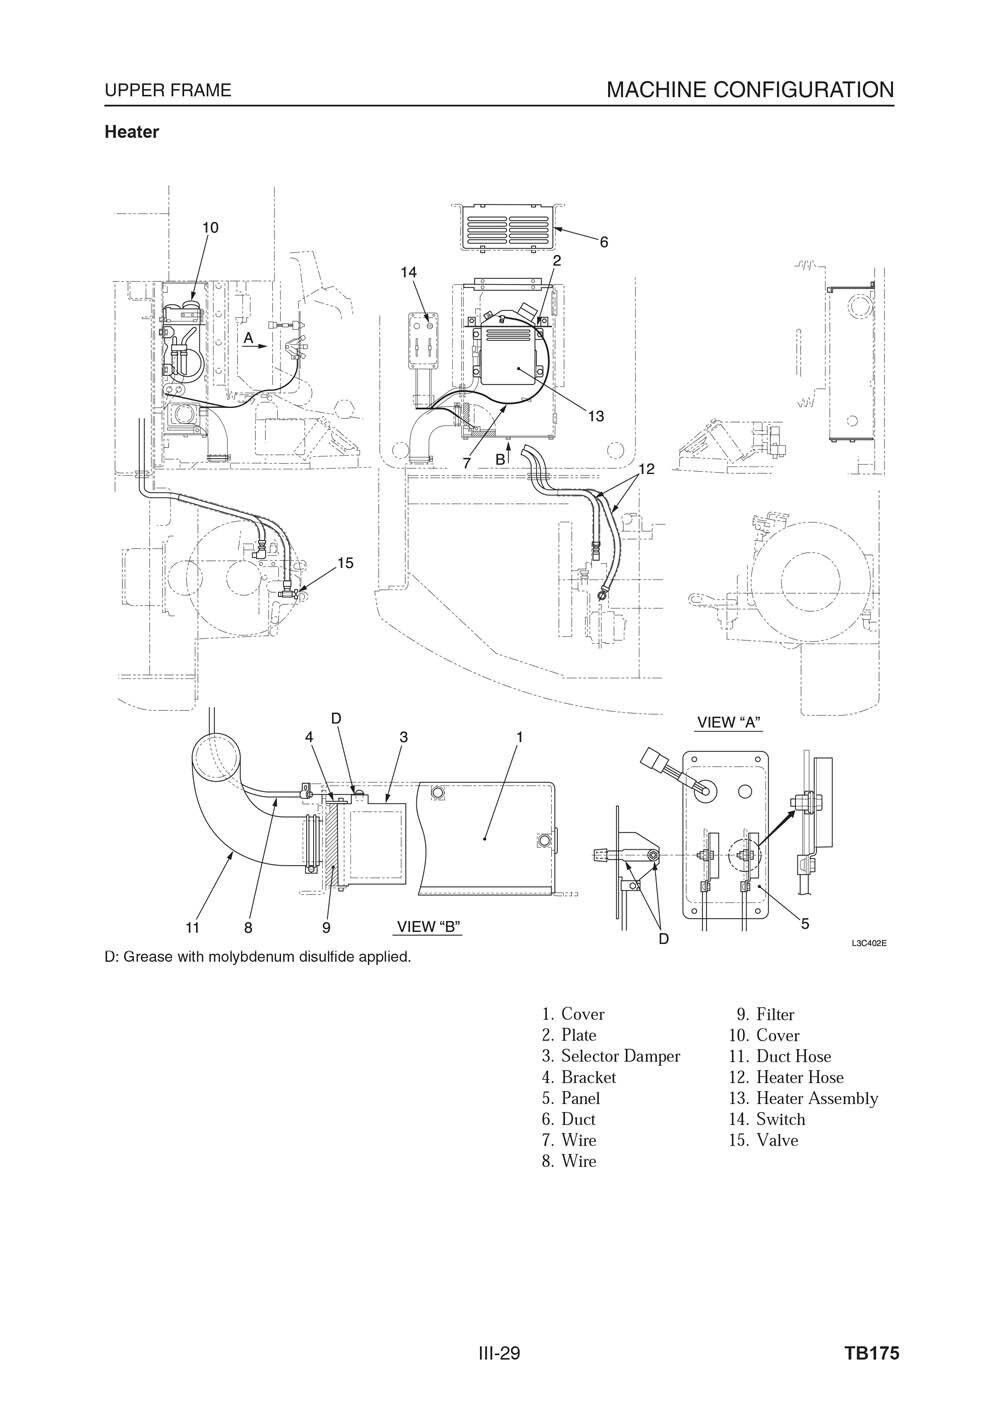 Takeuchi Tb175 Hydraulic Excavator Workshop Repair Service Manual Ebay Kubota Kx1213 Wiring Diagram